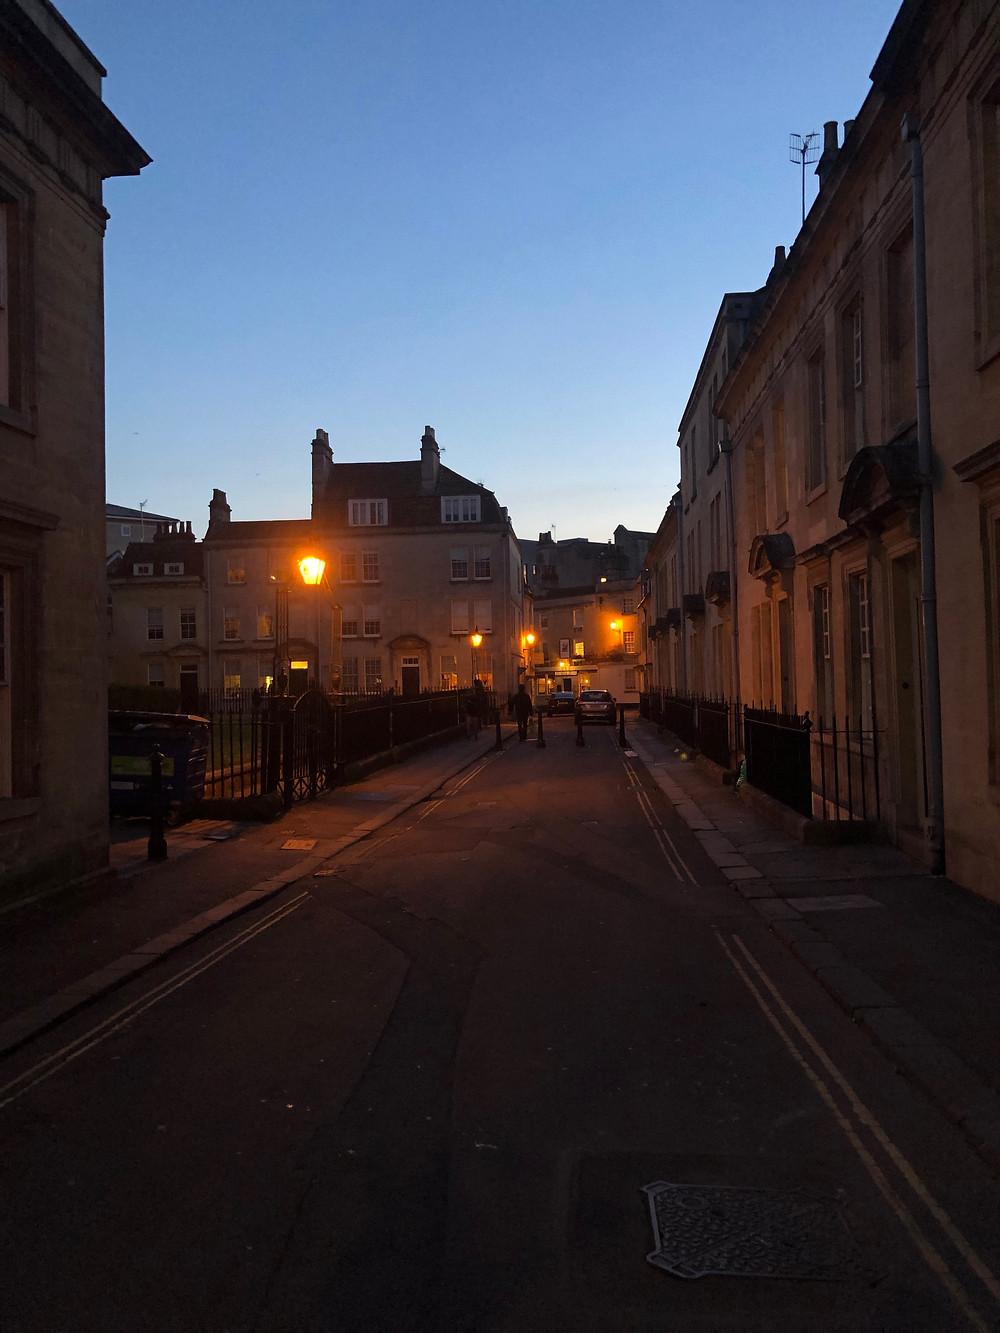 Night photo of a street in Bath.